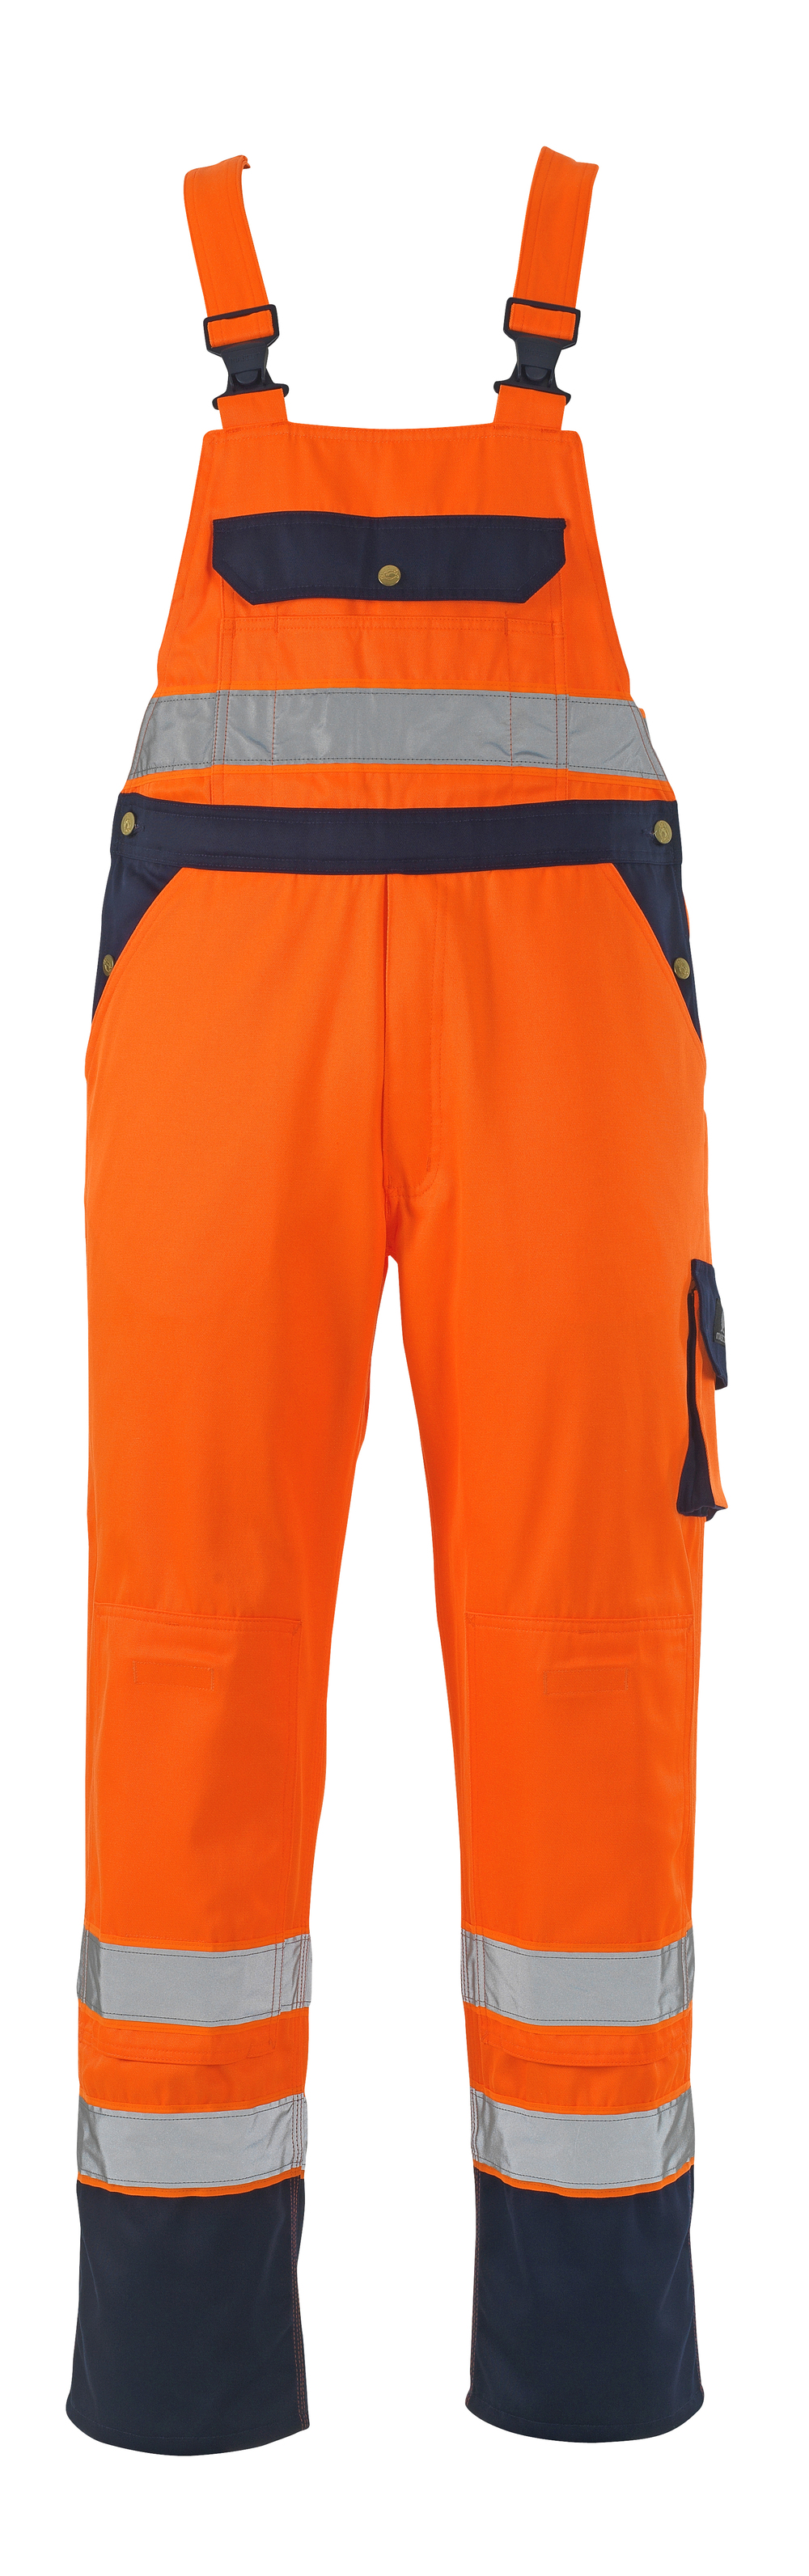 00969-860-141 Salopette avec poches genouillères - Hi-vis orange/Marine